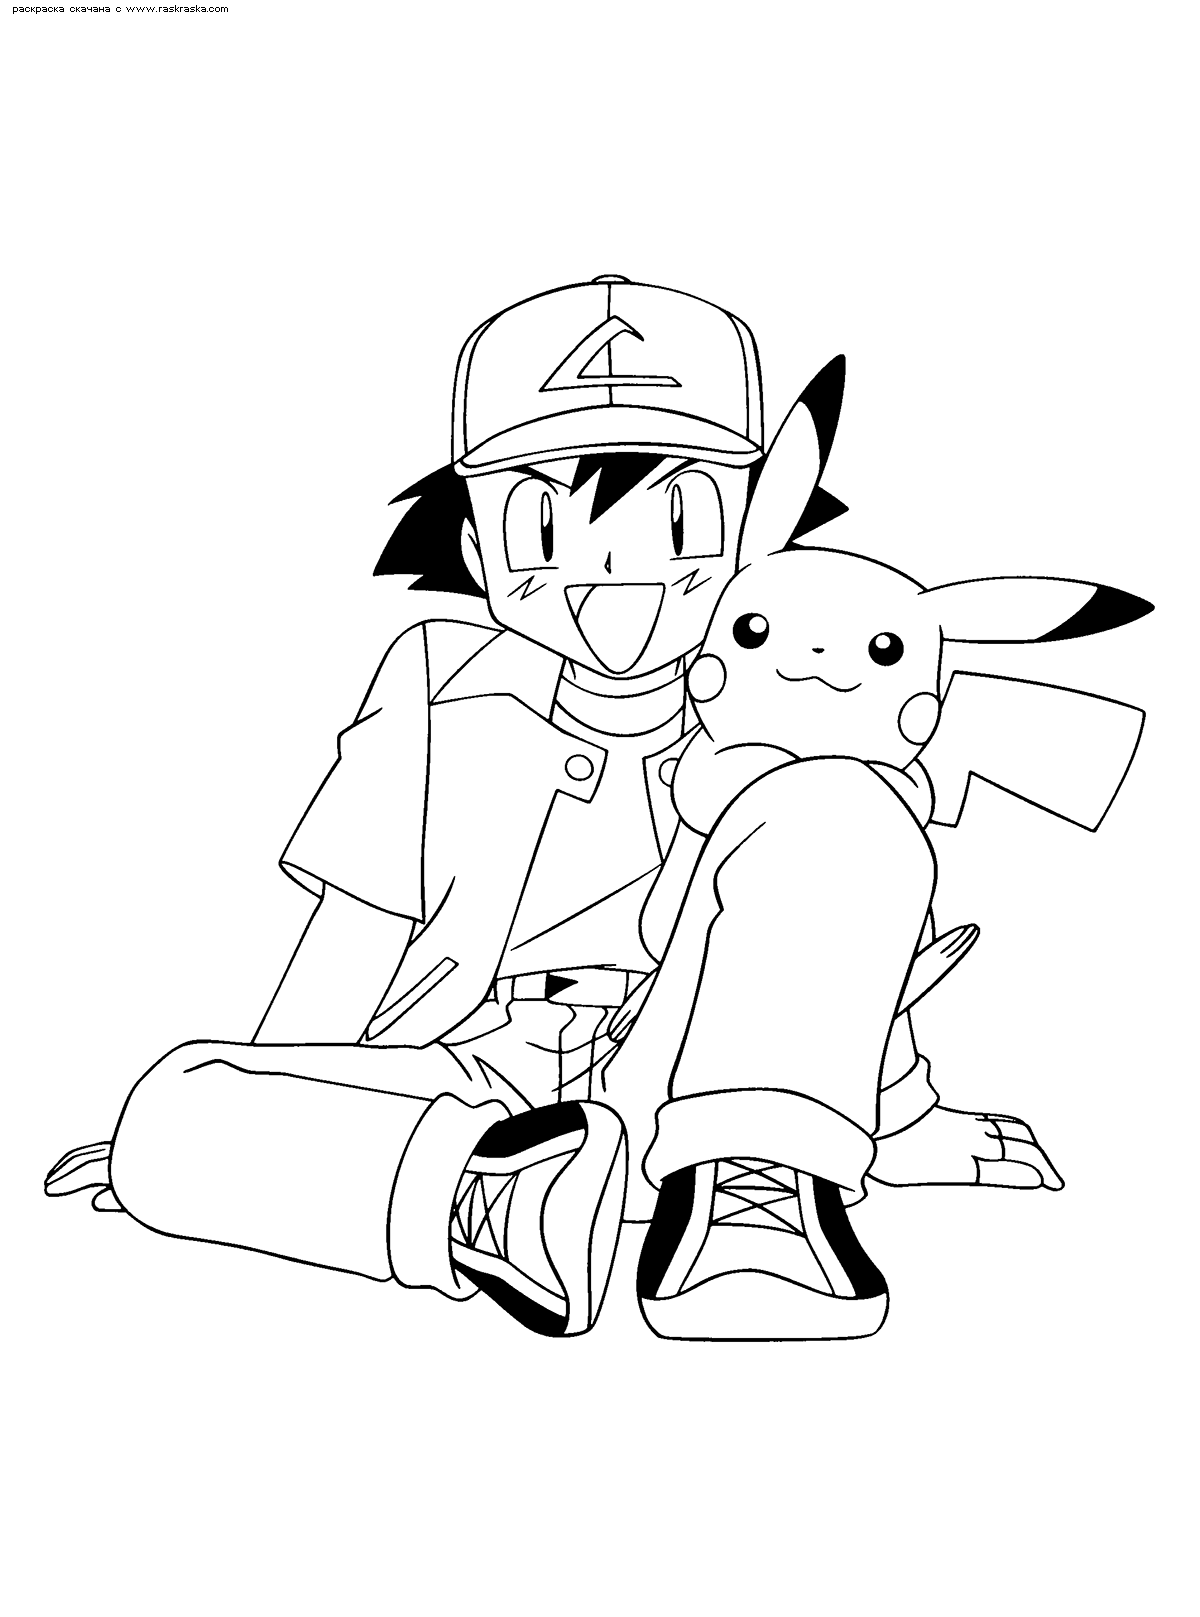 Раскраска Эш и Пикачу | Раскраски Пикачу (Pikachu)